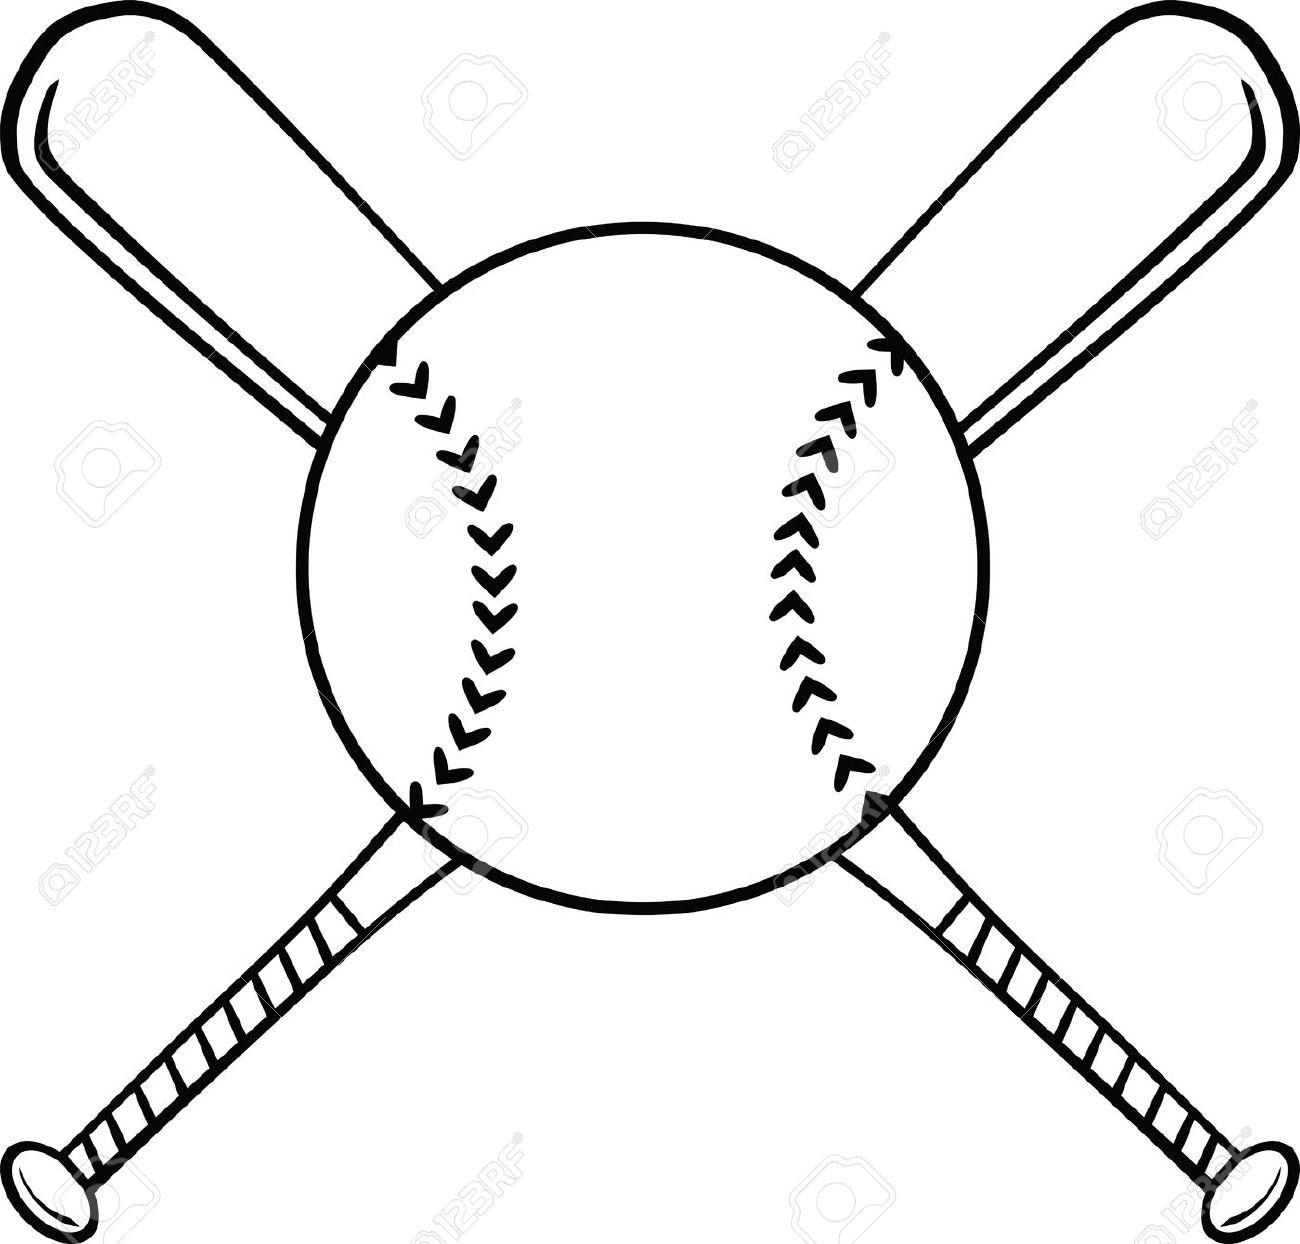 Baseball Bat Clip Art Black .-Baseball Bat Clip Art Black .-3